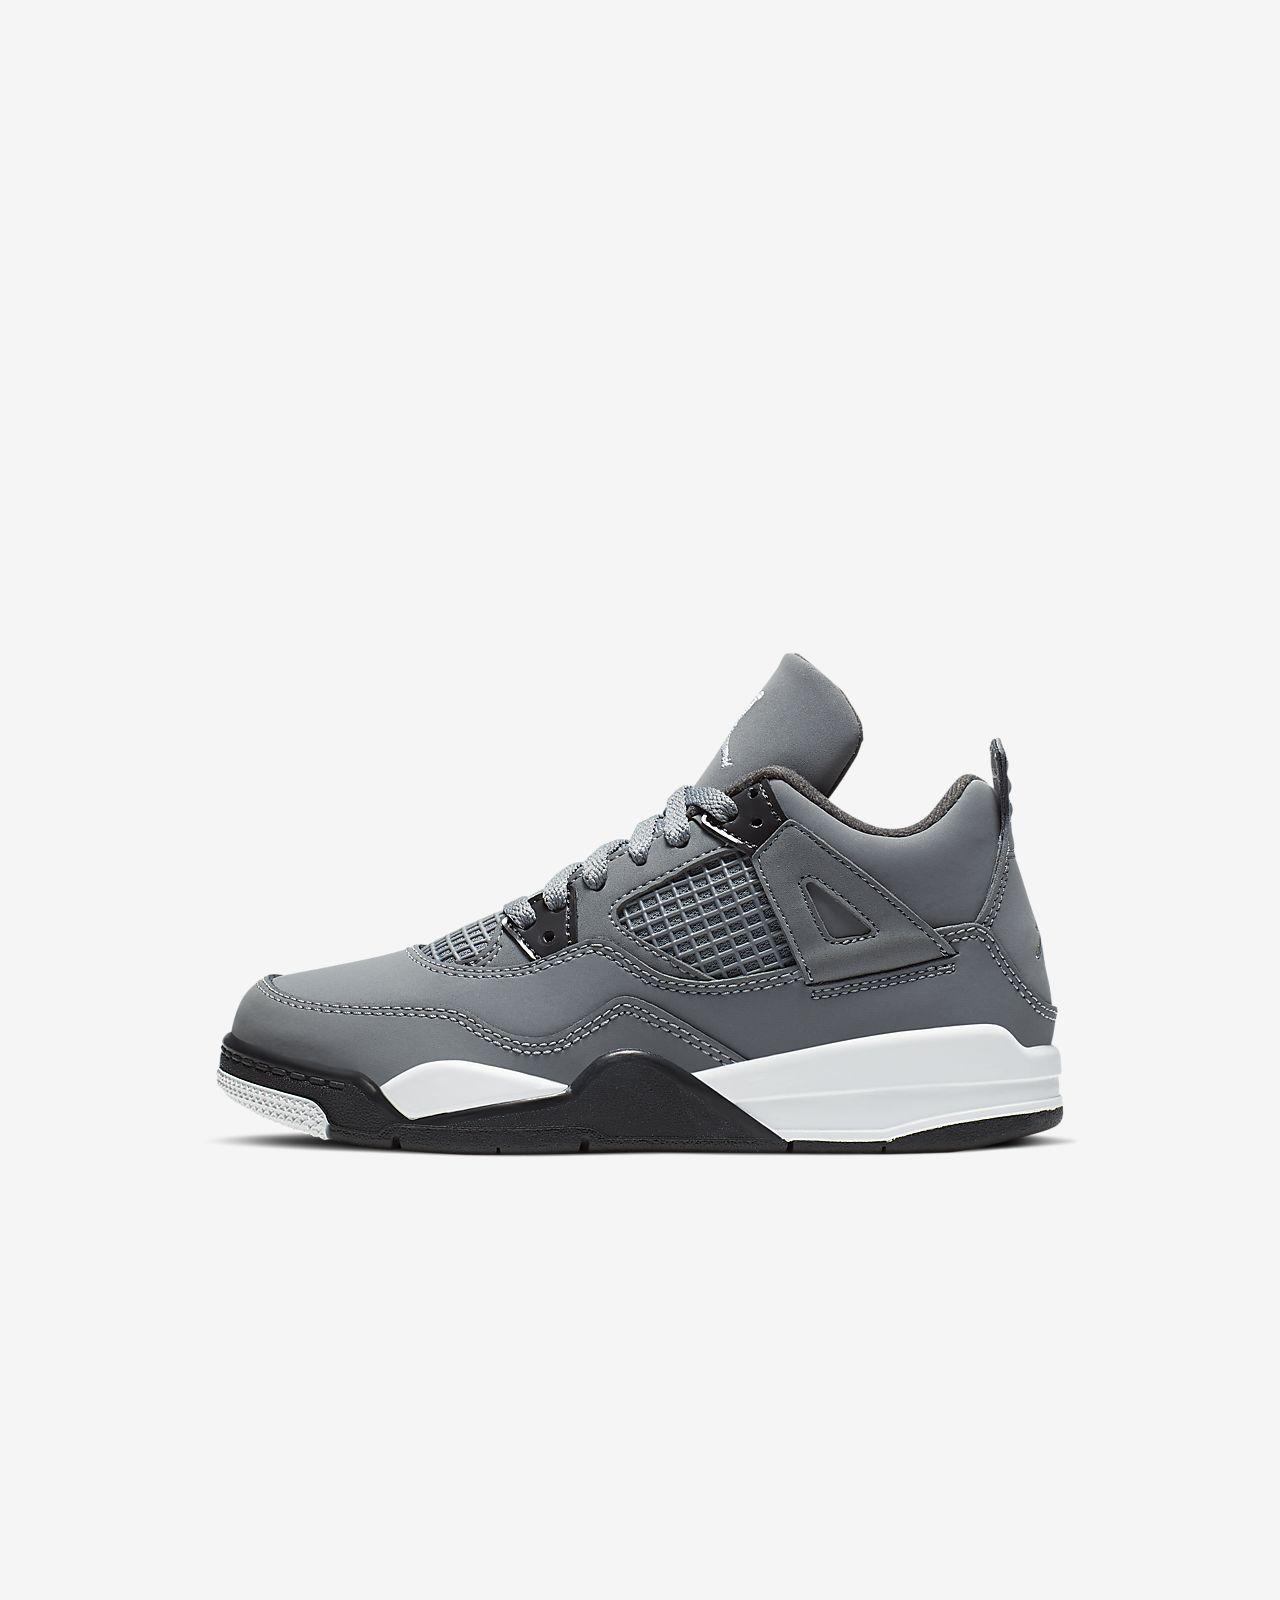 Jordan 4 Retro Younger Kids' Shoe